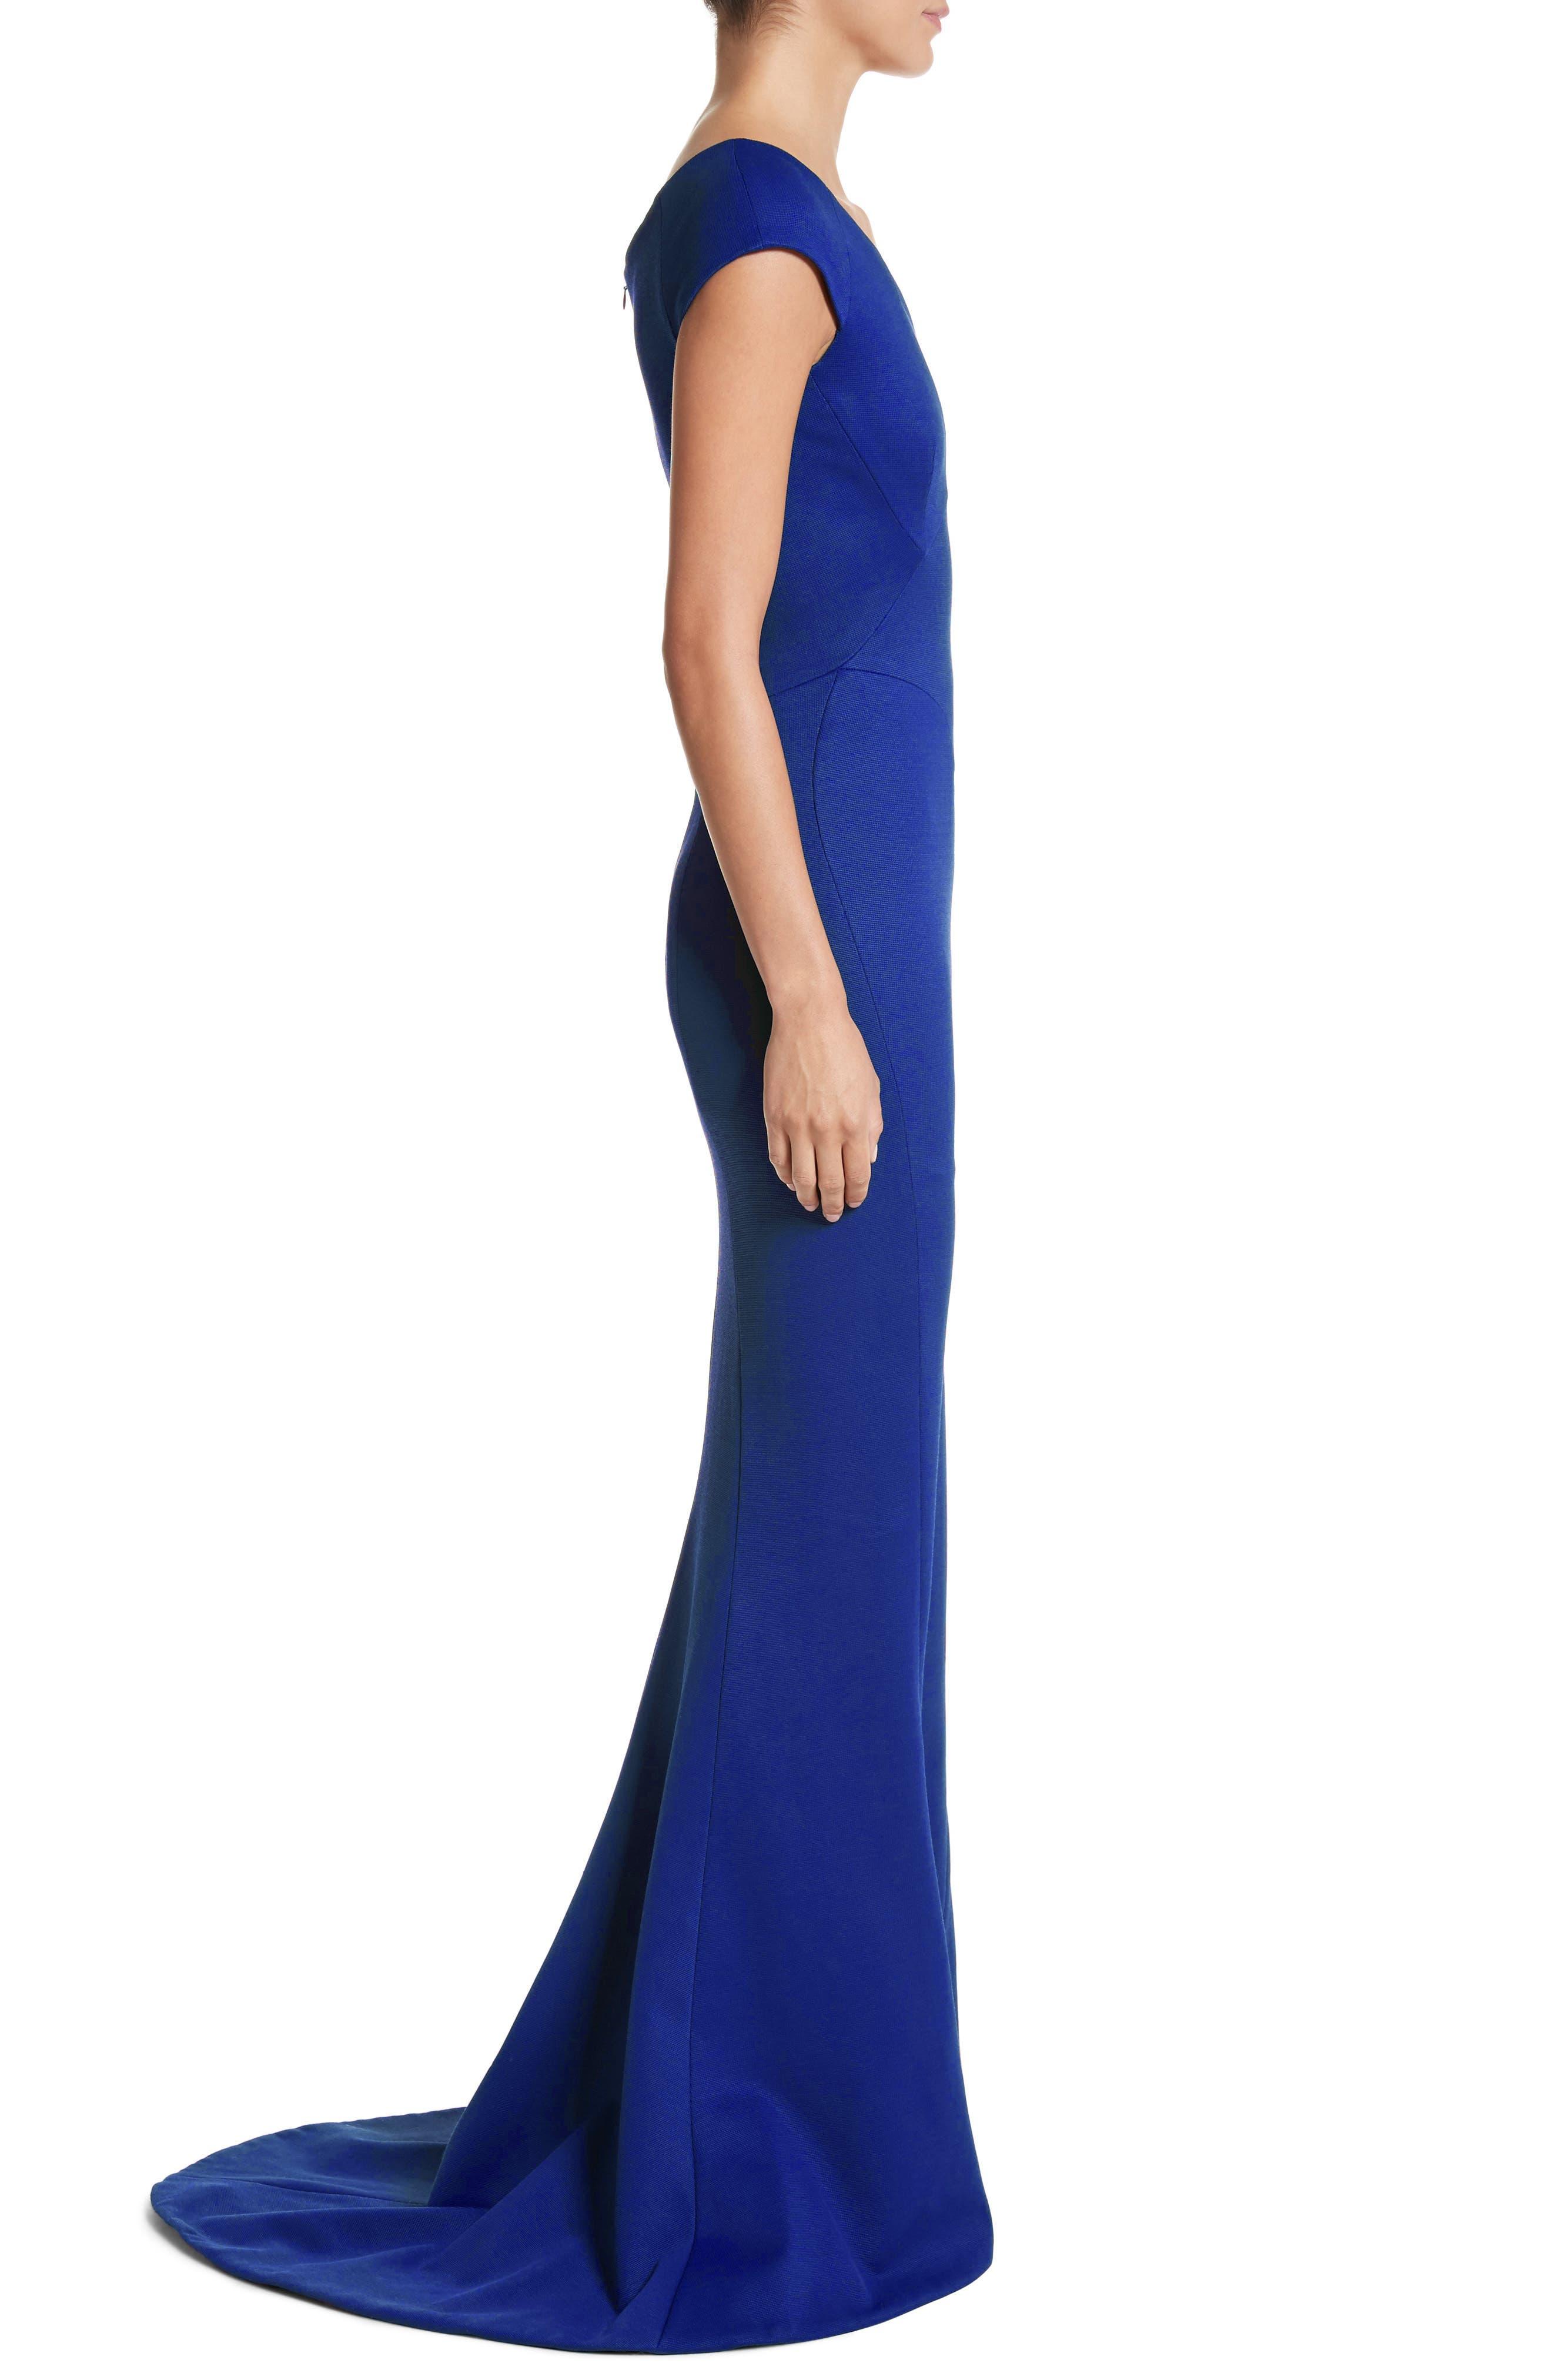 Alternate Image 3  - Zac Posen Bonded Jersey Mermaid Gown